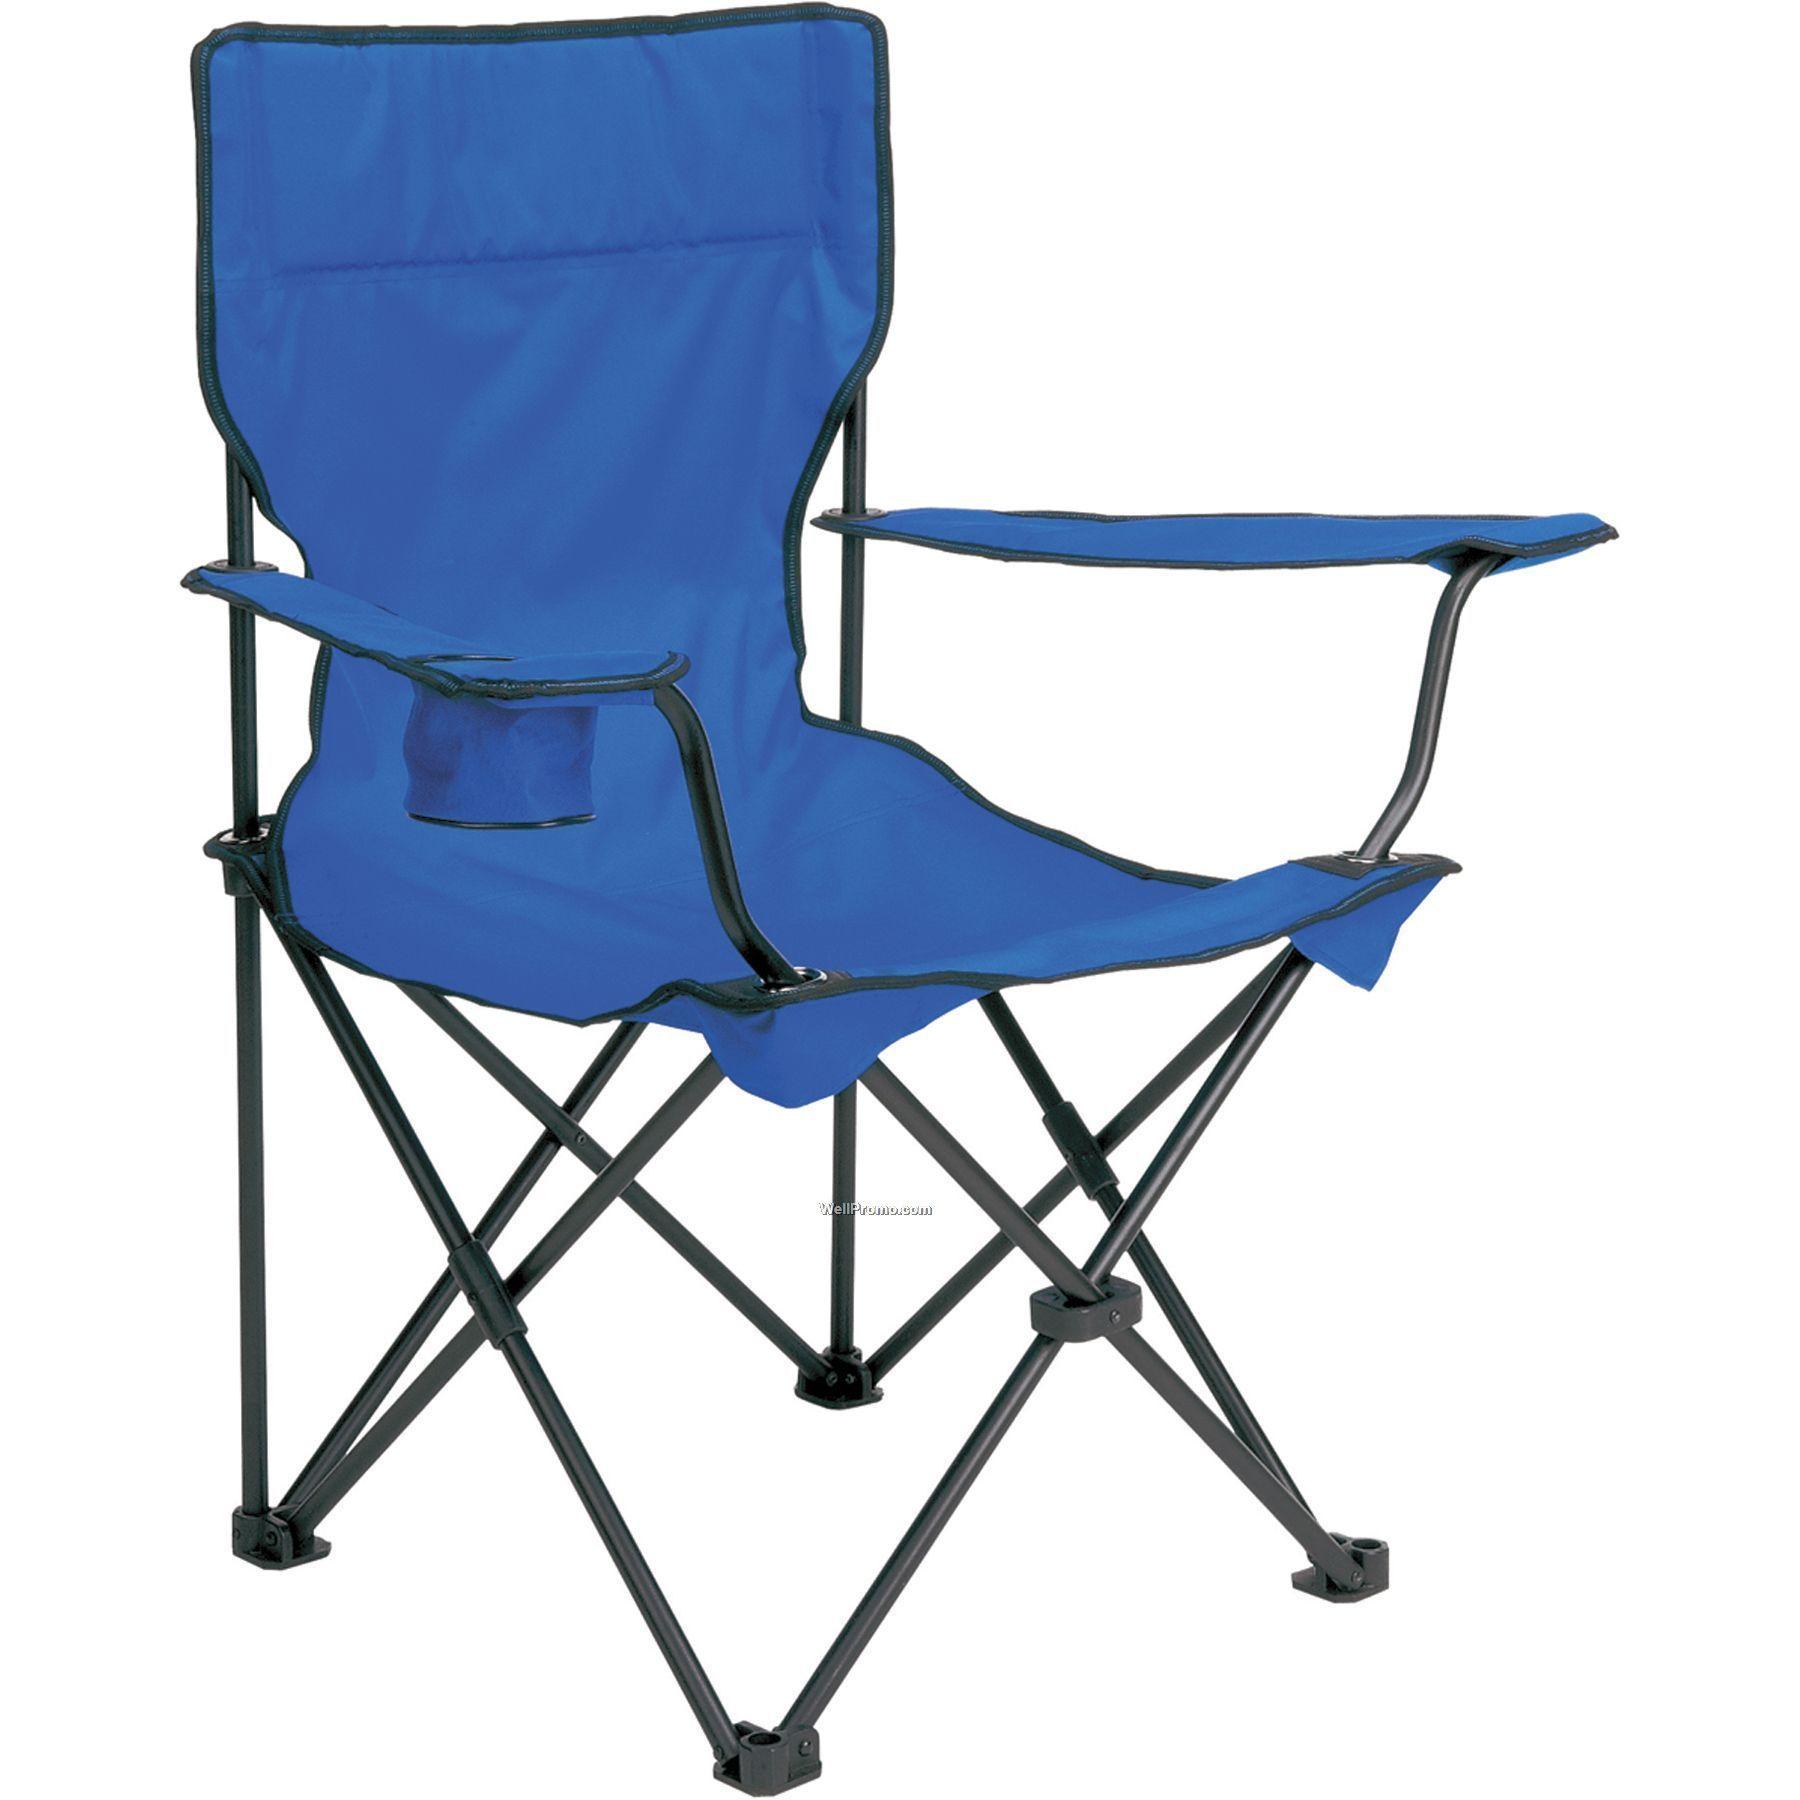 Elegant 35 Pictures of Unique Folding Folding Lawn Chairs